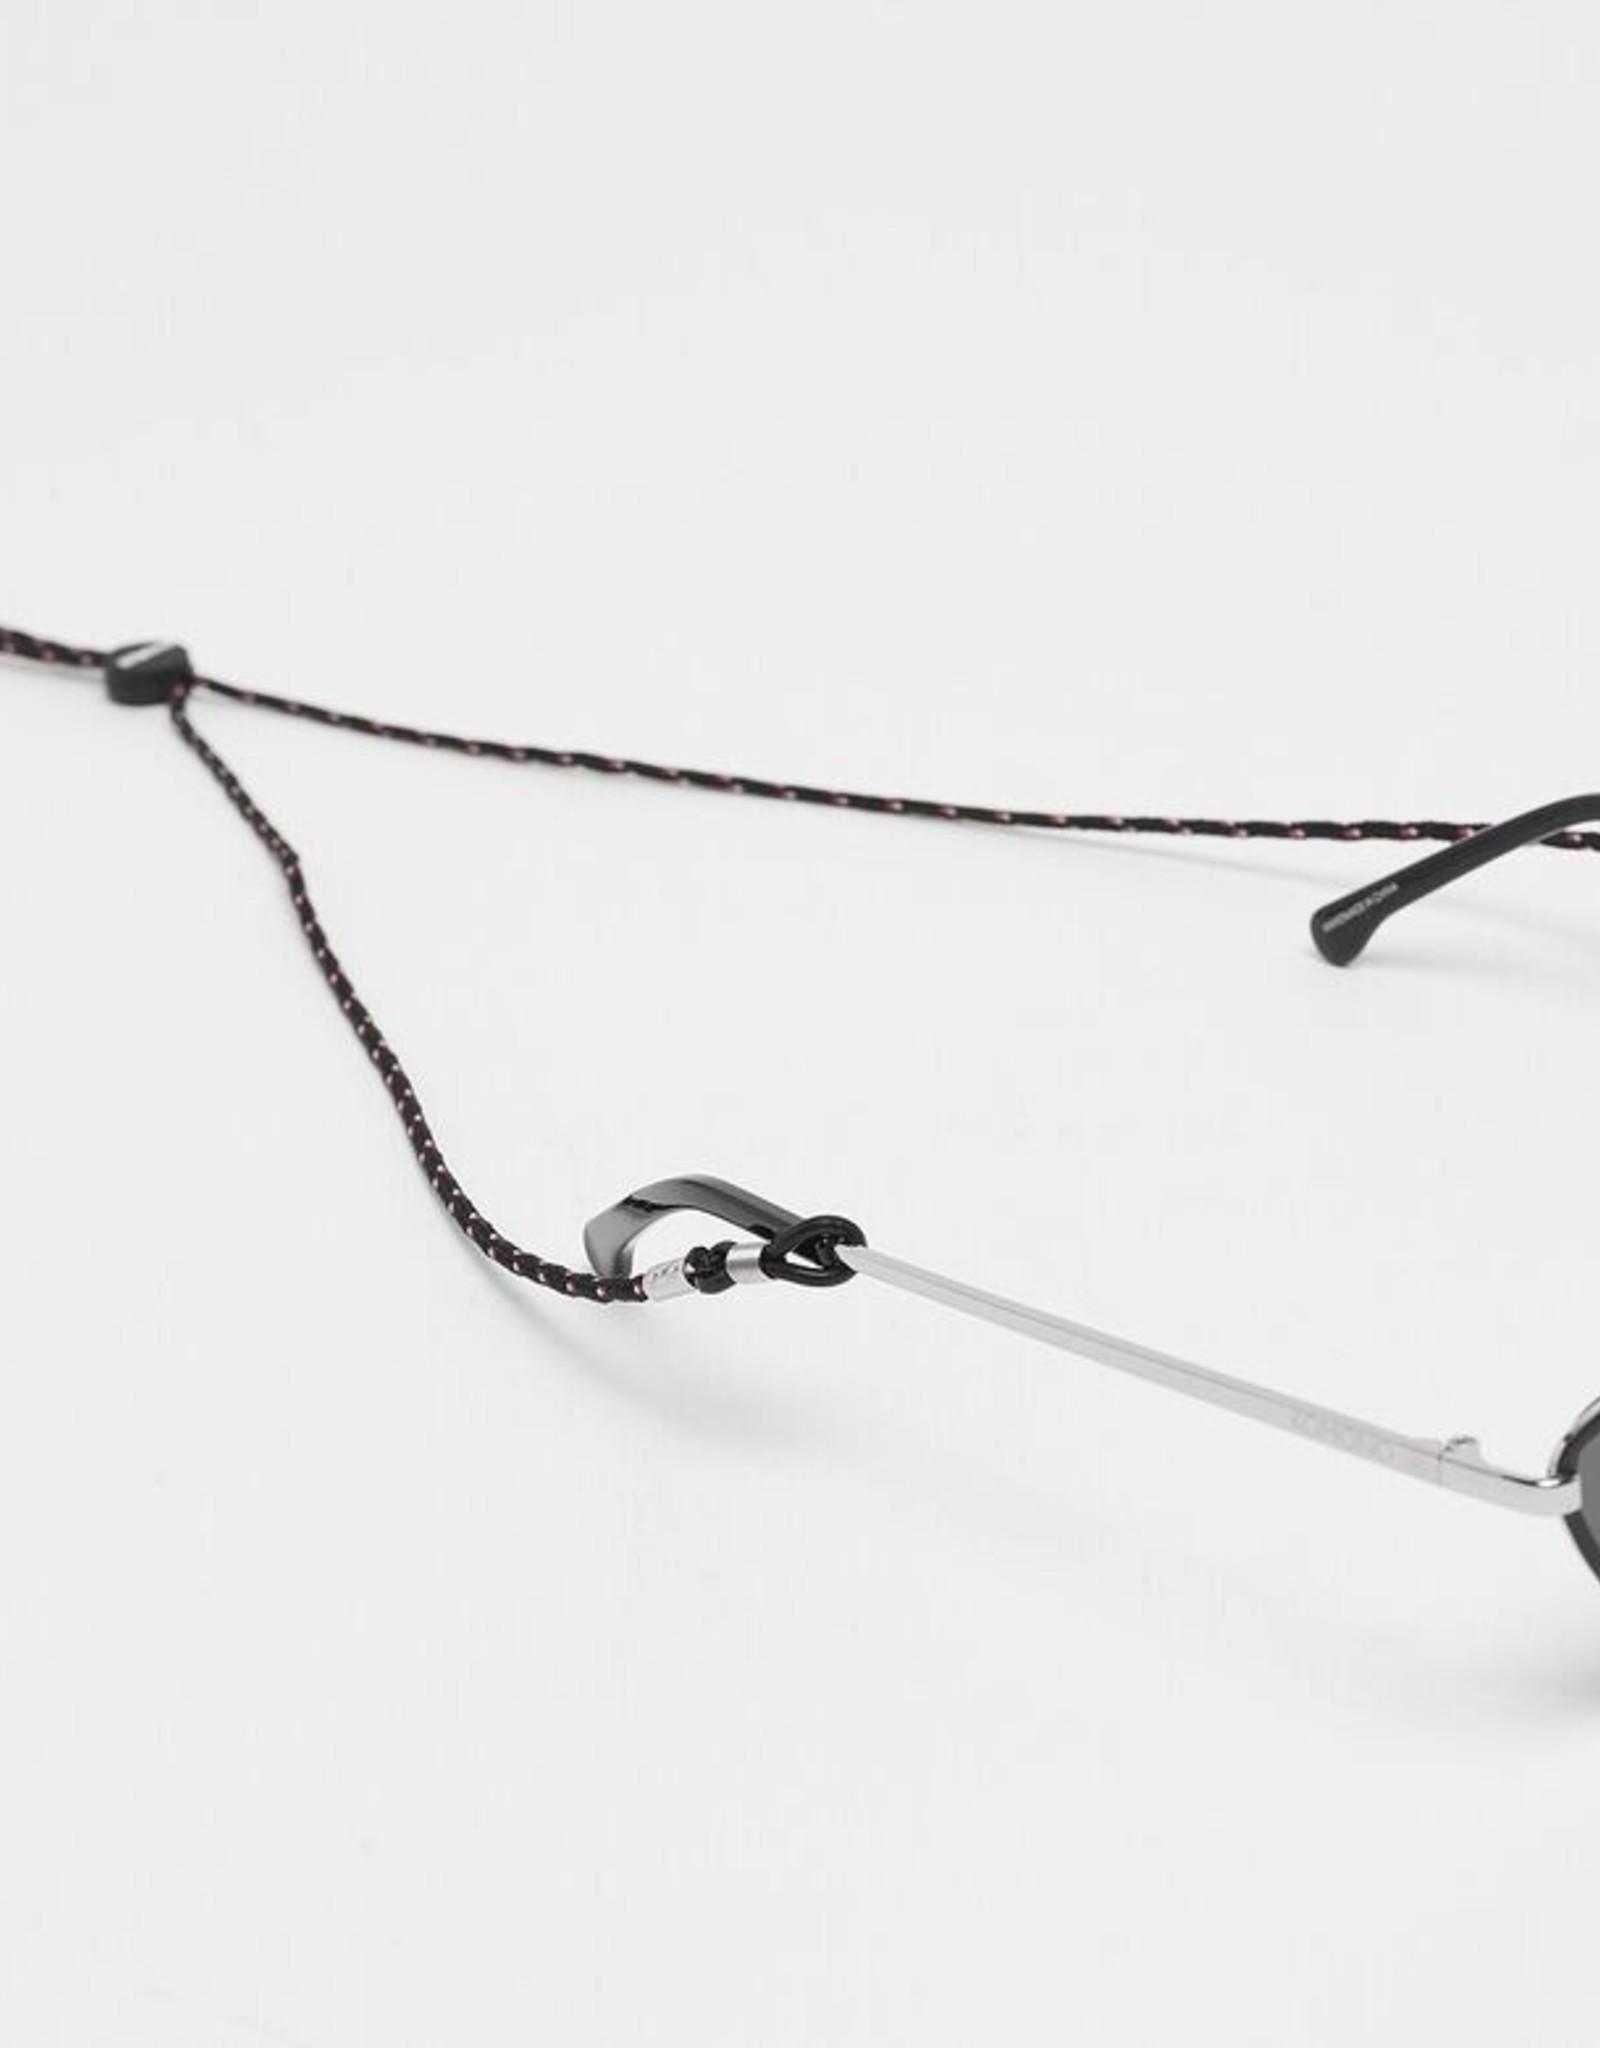 Komono Komono - Zonnebril-ketting - Hyper black